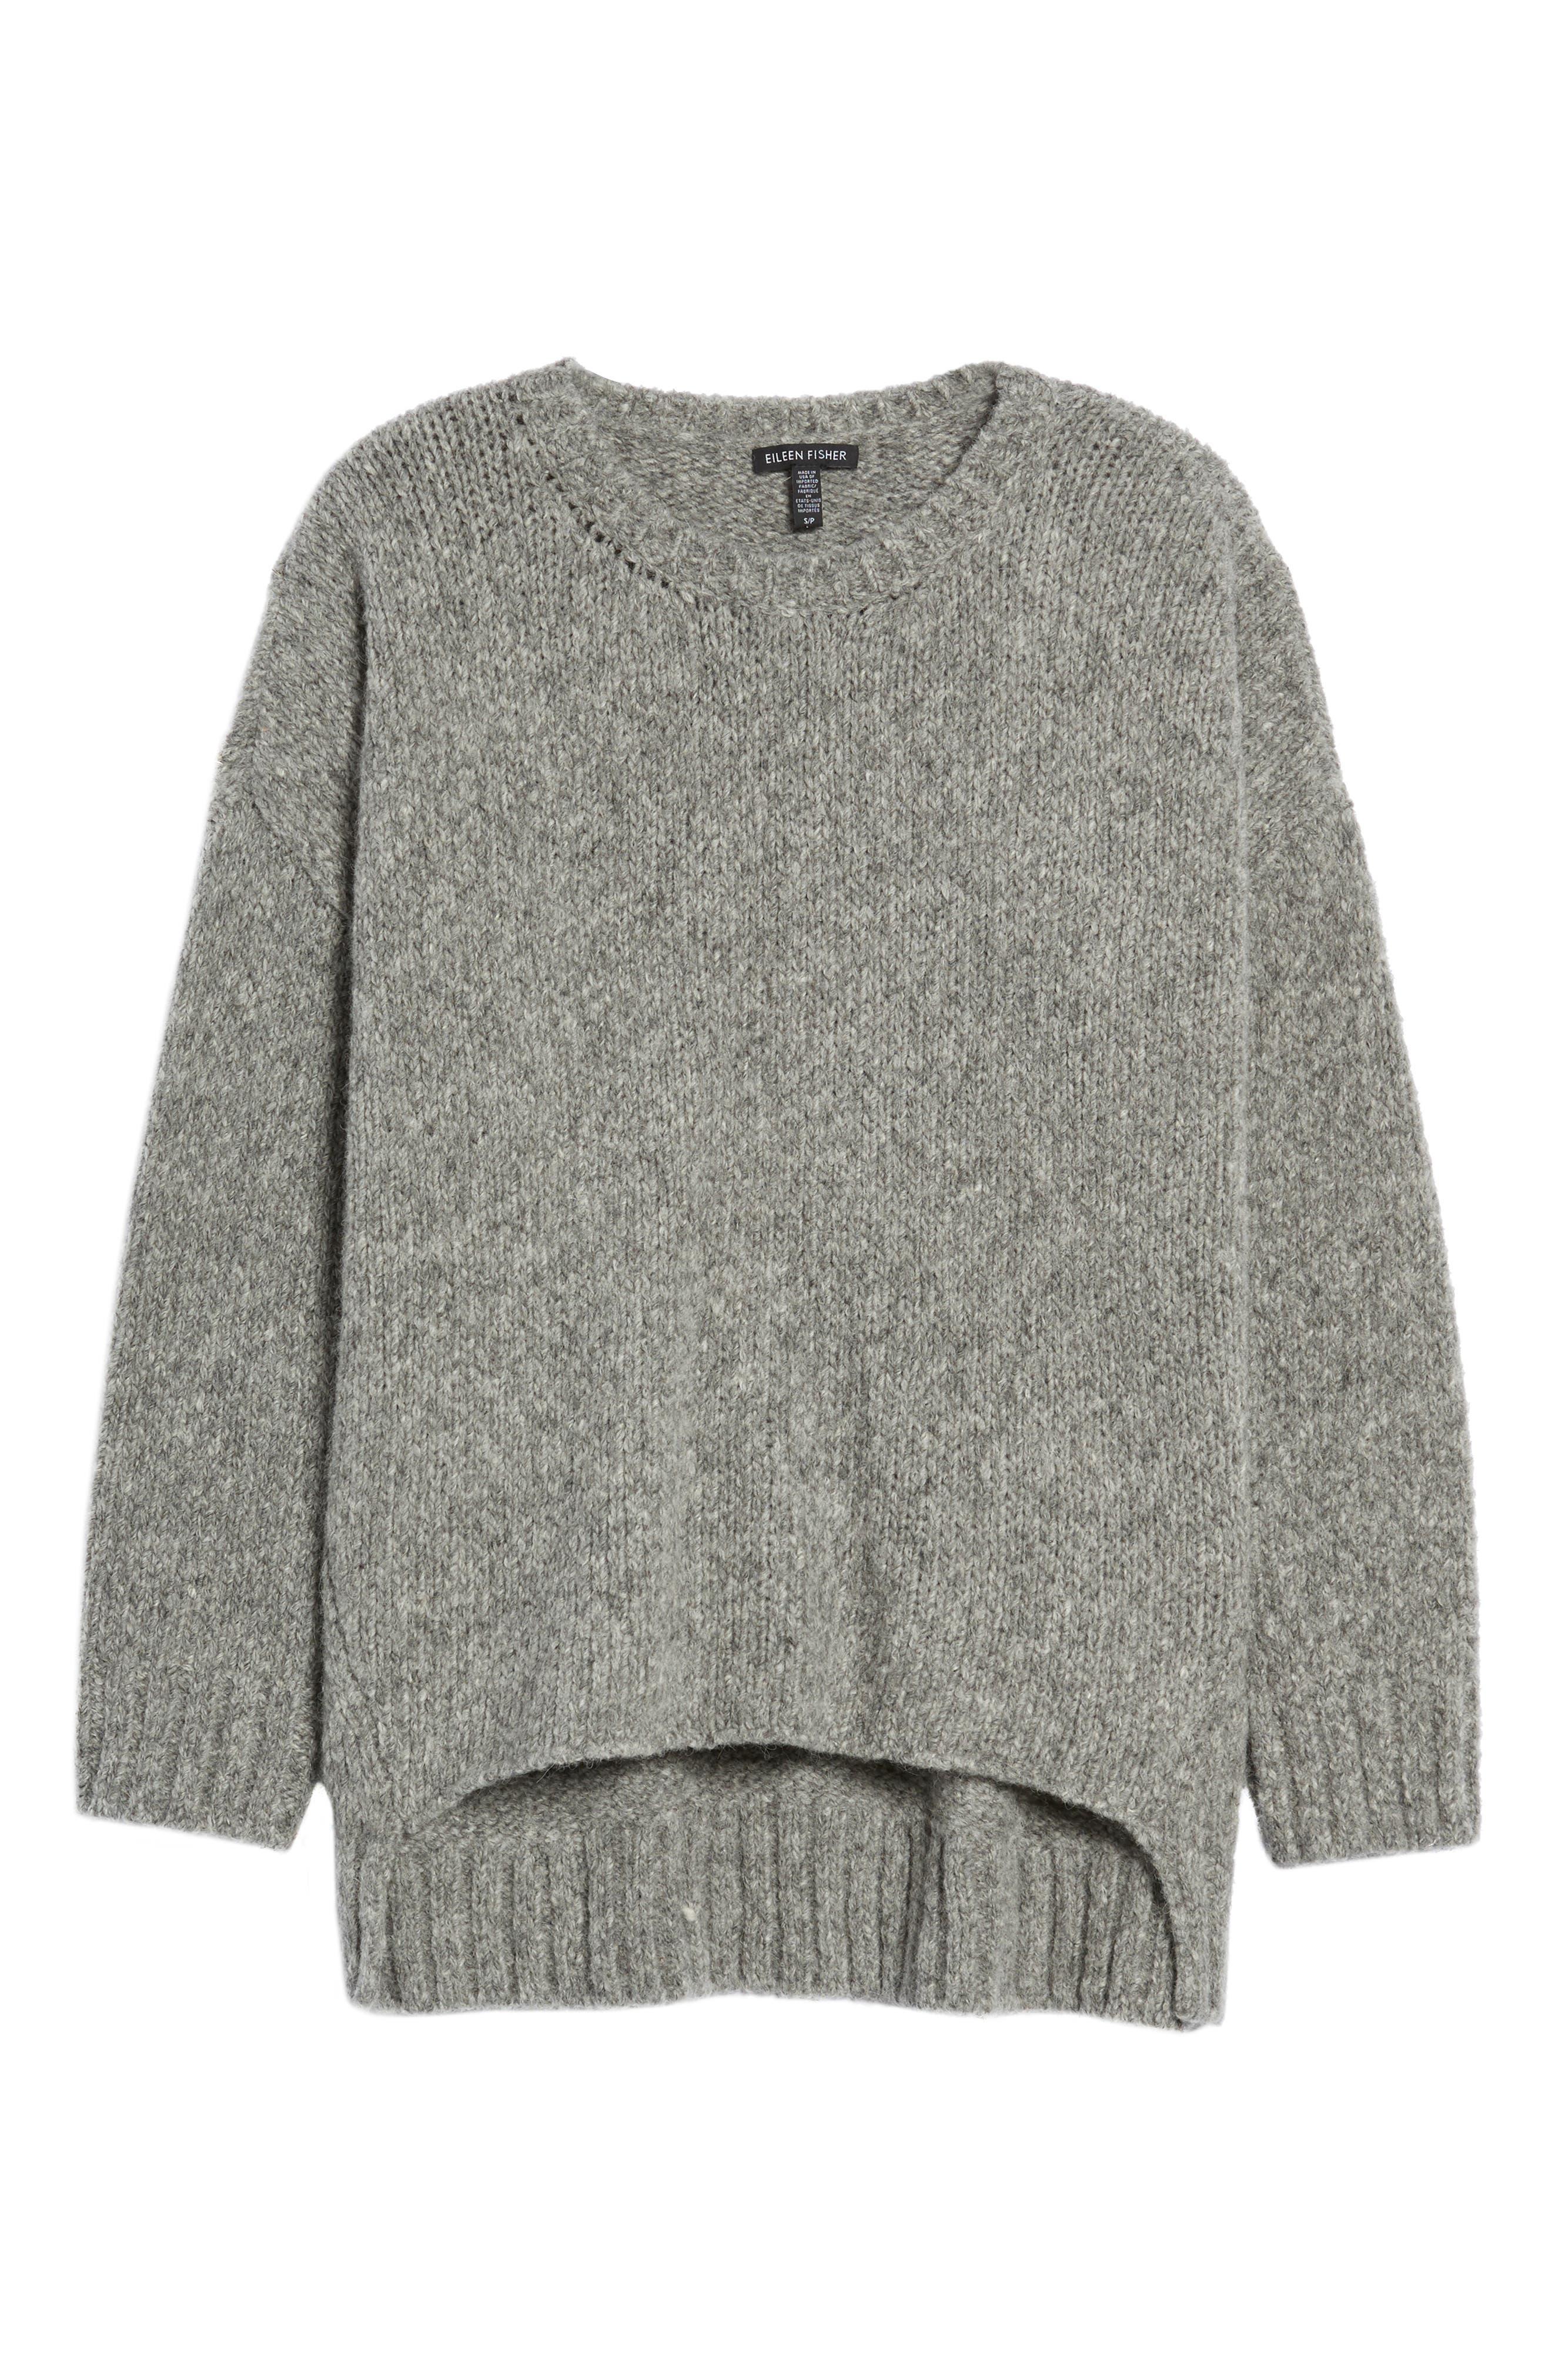 High/Low Alpaca Blend Sweater,                             Alternate thumbnail 6, color,                             187